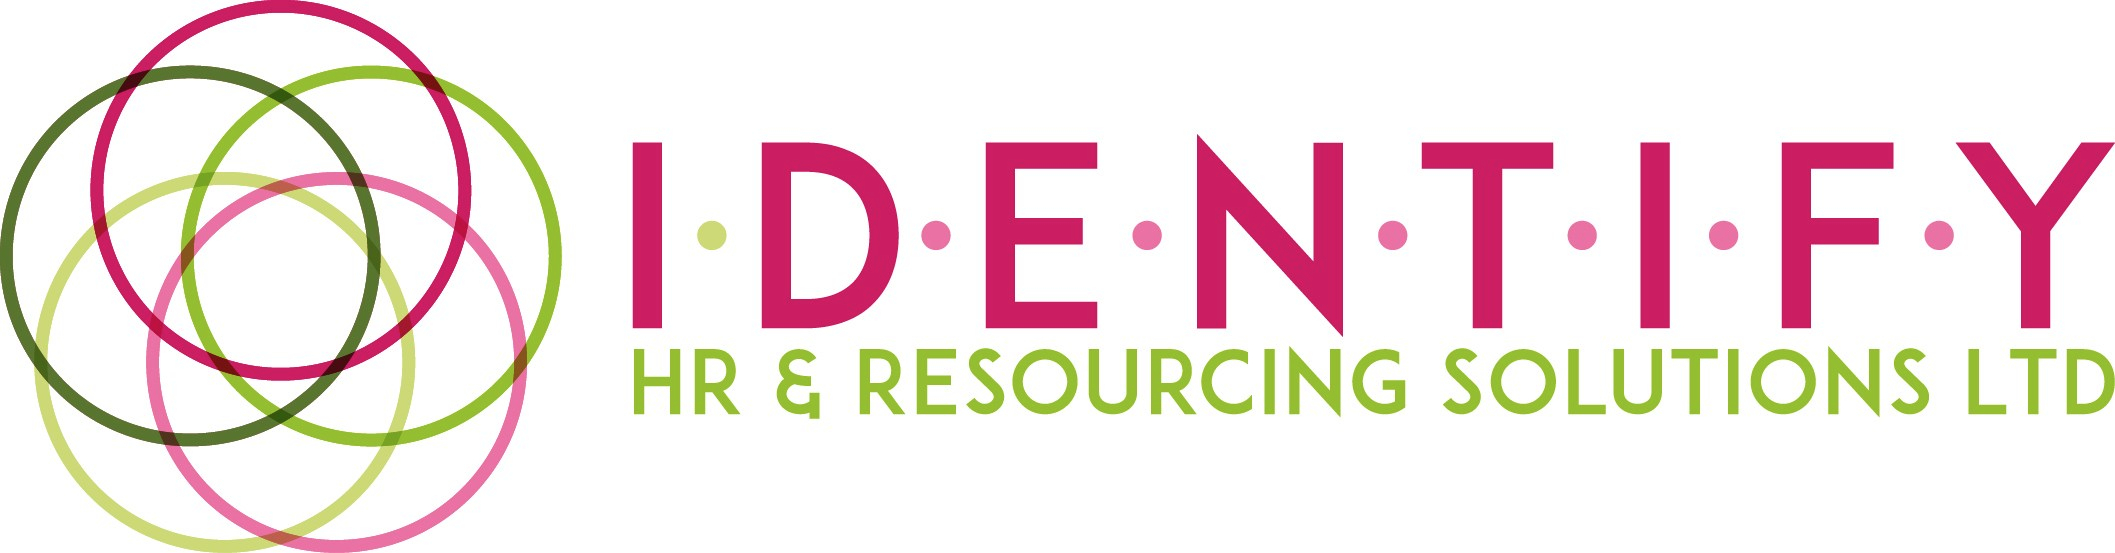 I-Dentify Logo Long Format RGB